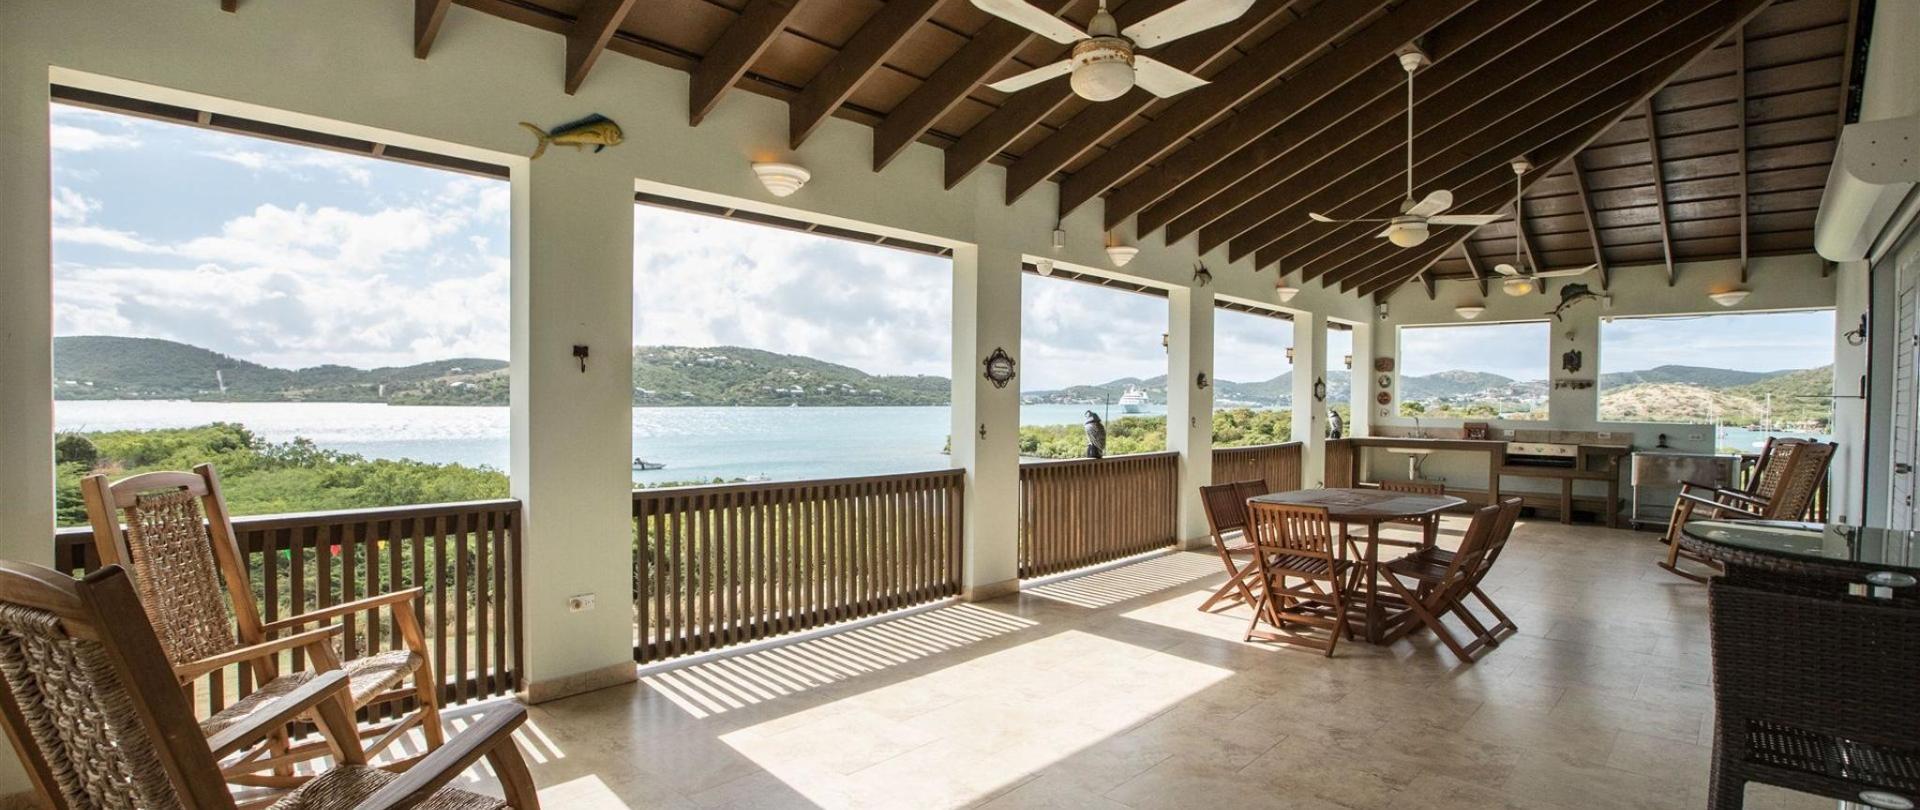 Caribbean Vacation Rentals 5.jpg